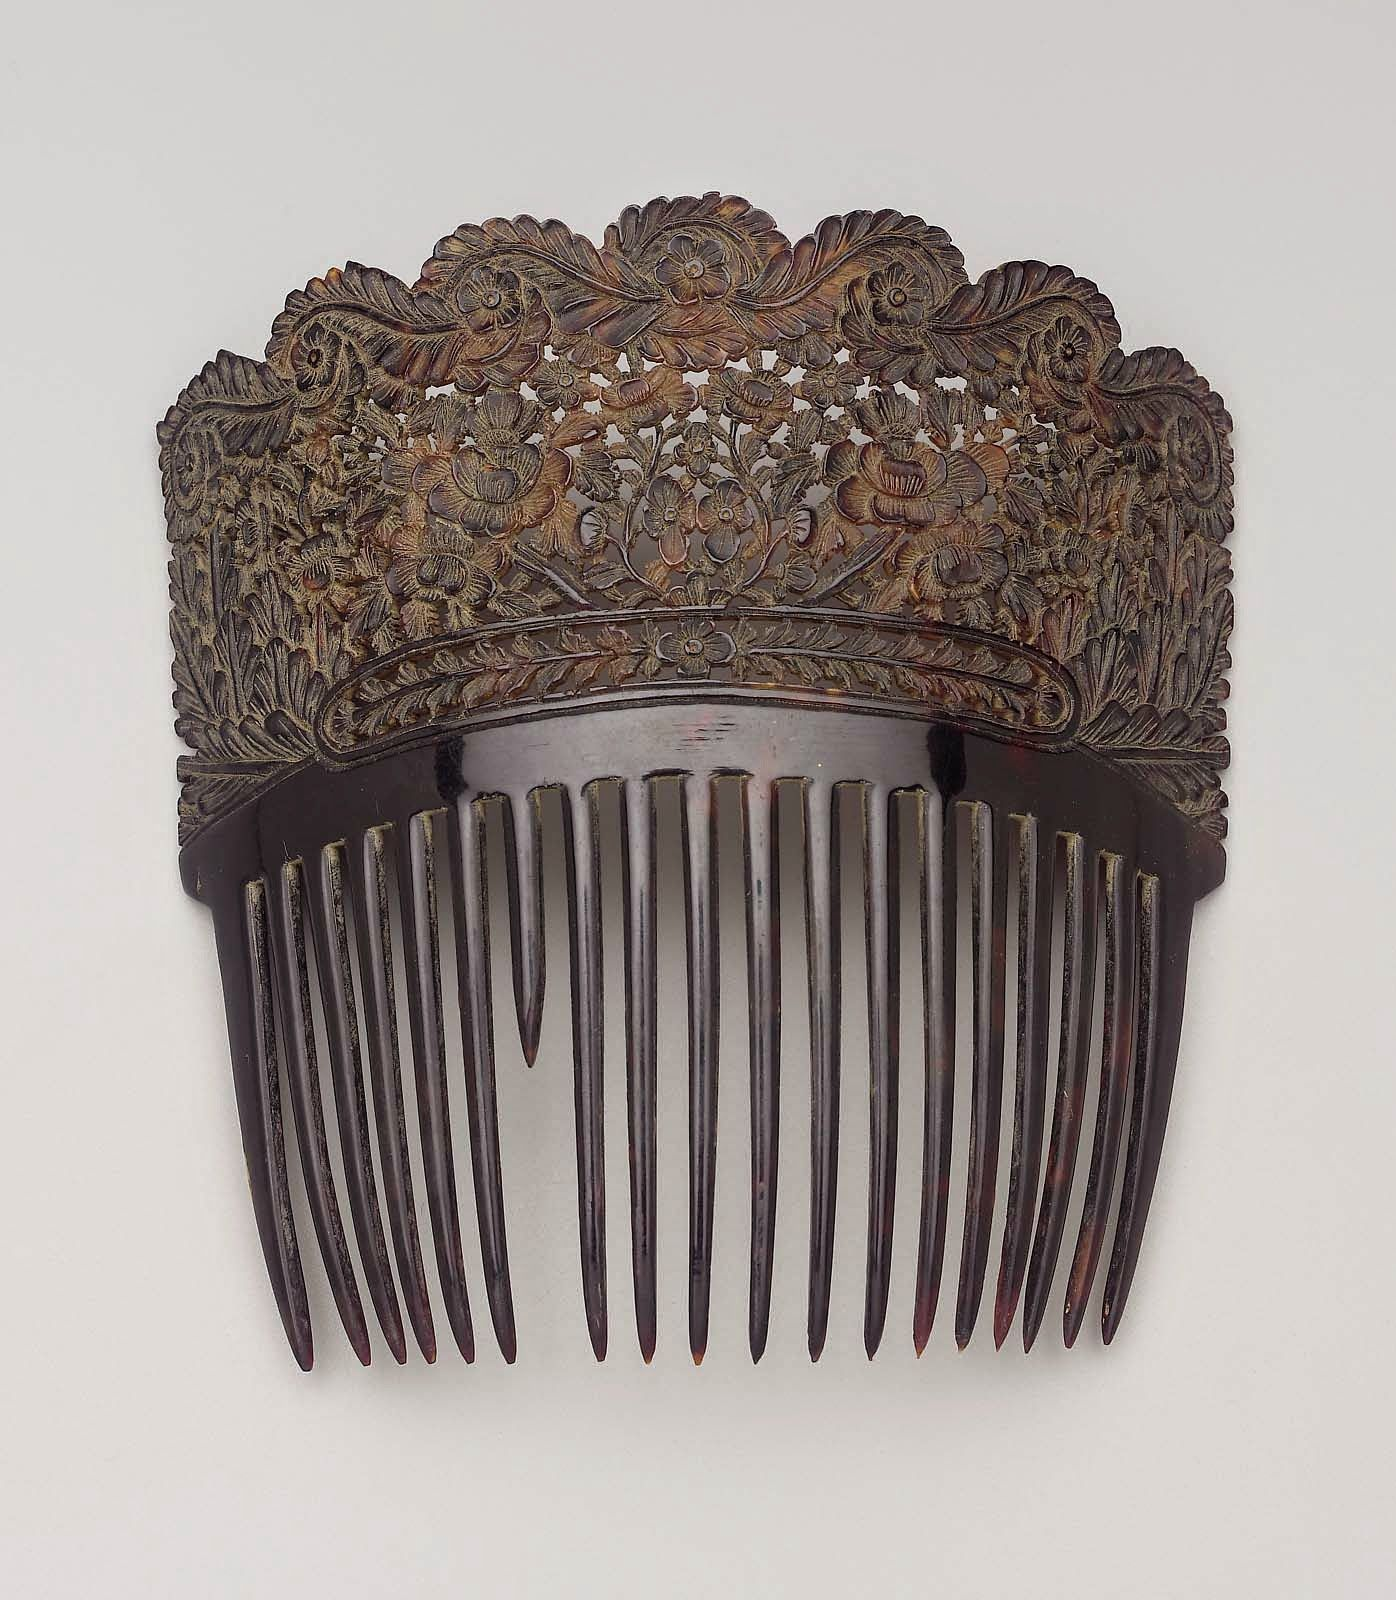 Tortoiseshell comb, 19th cent. American